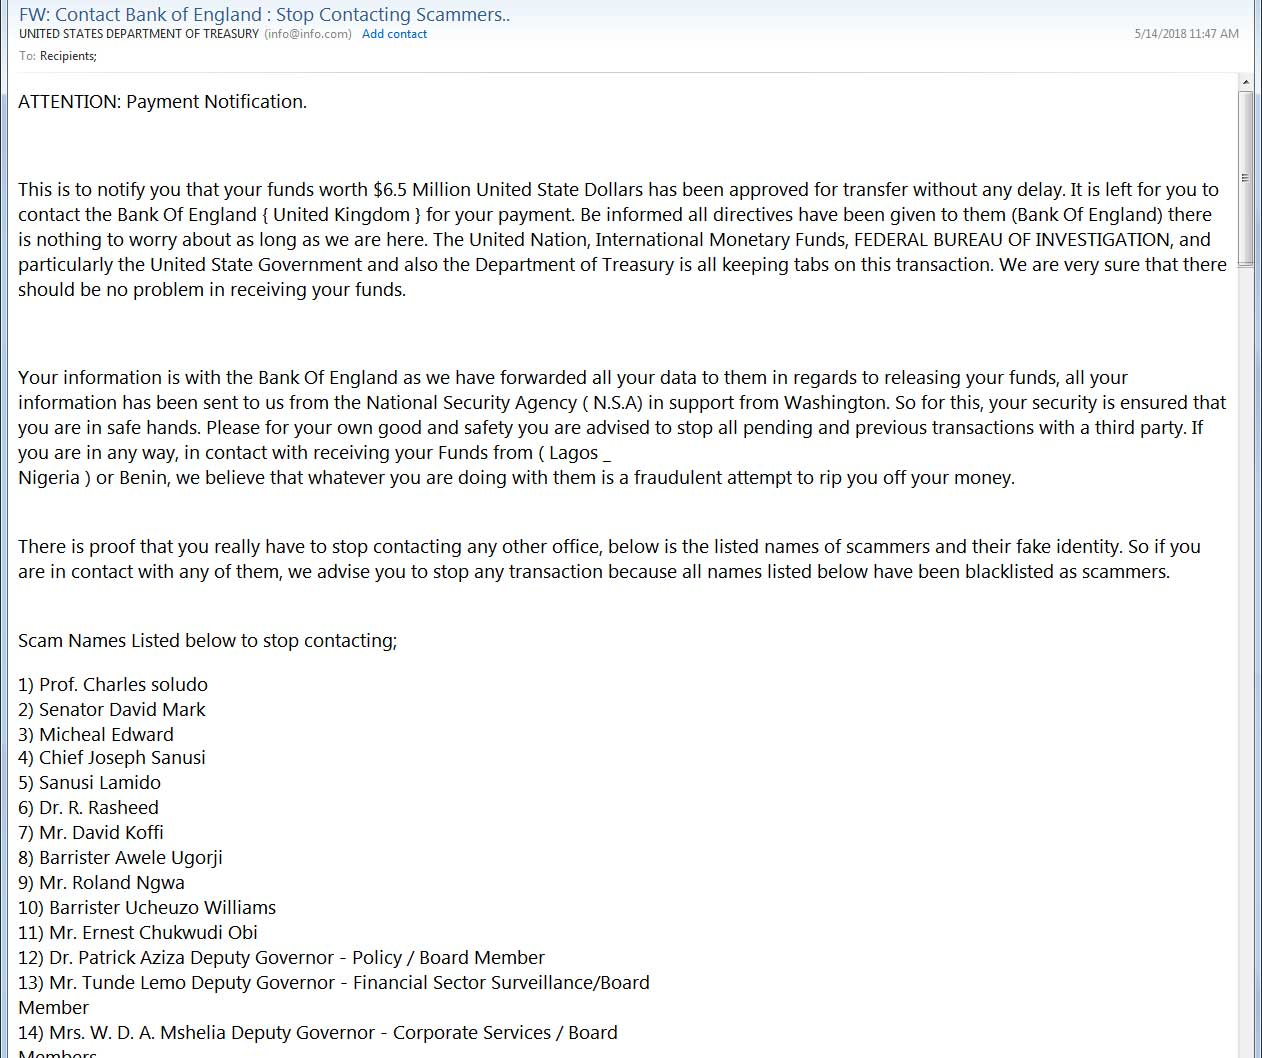 Phishing Scam Part 1